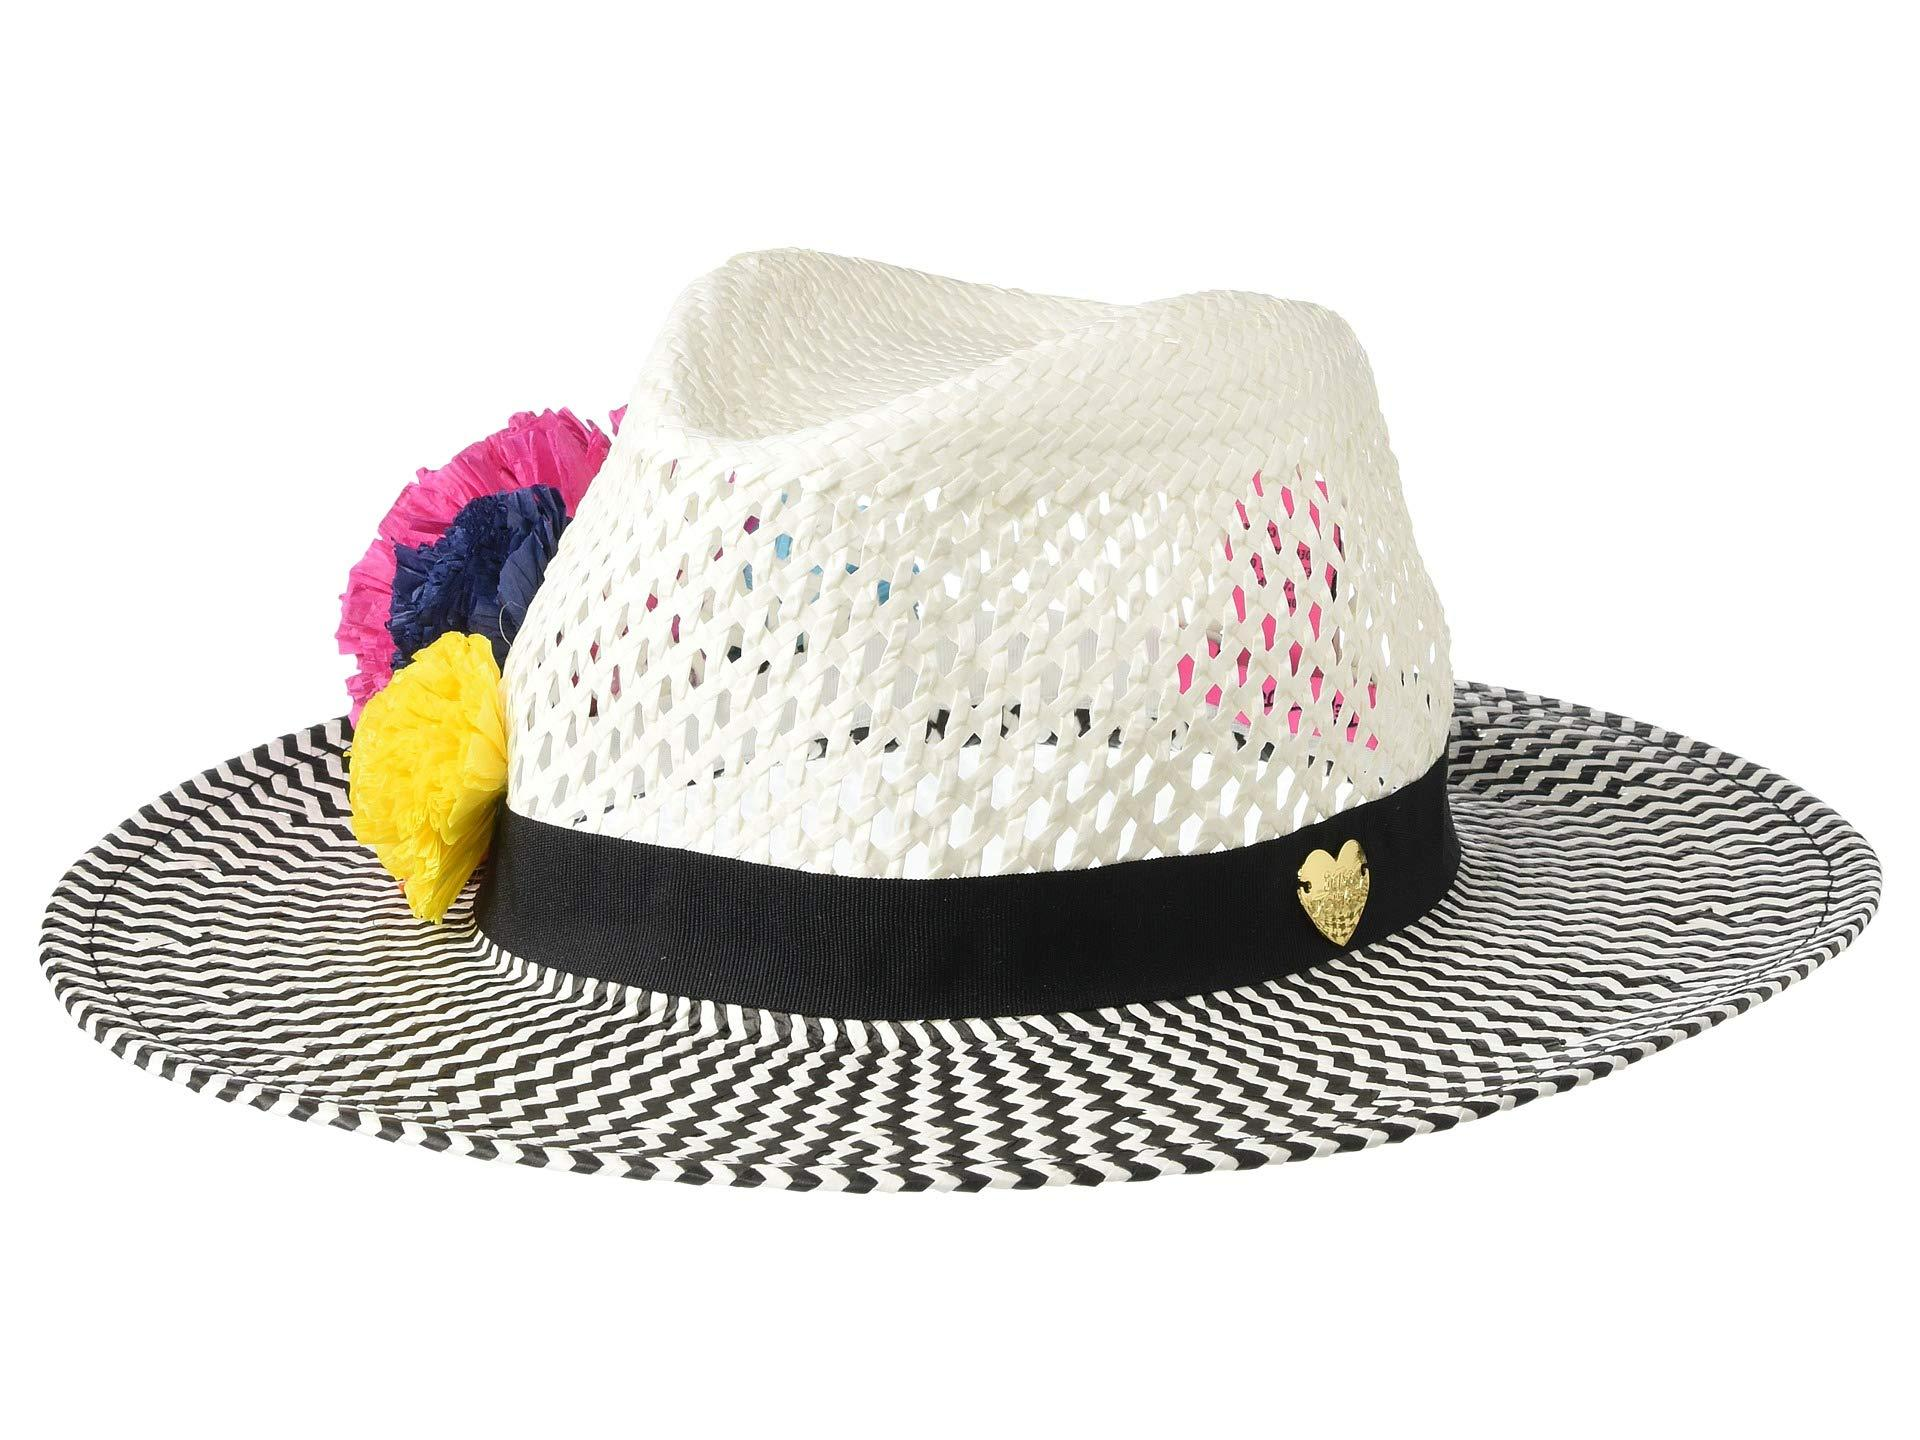 ef3113e9a87d7d Lyst - Betsey Johnson Pom Pom Panama Hat (white) Caps in White